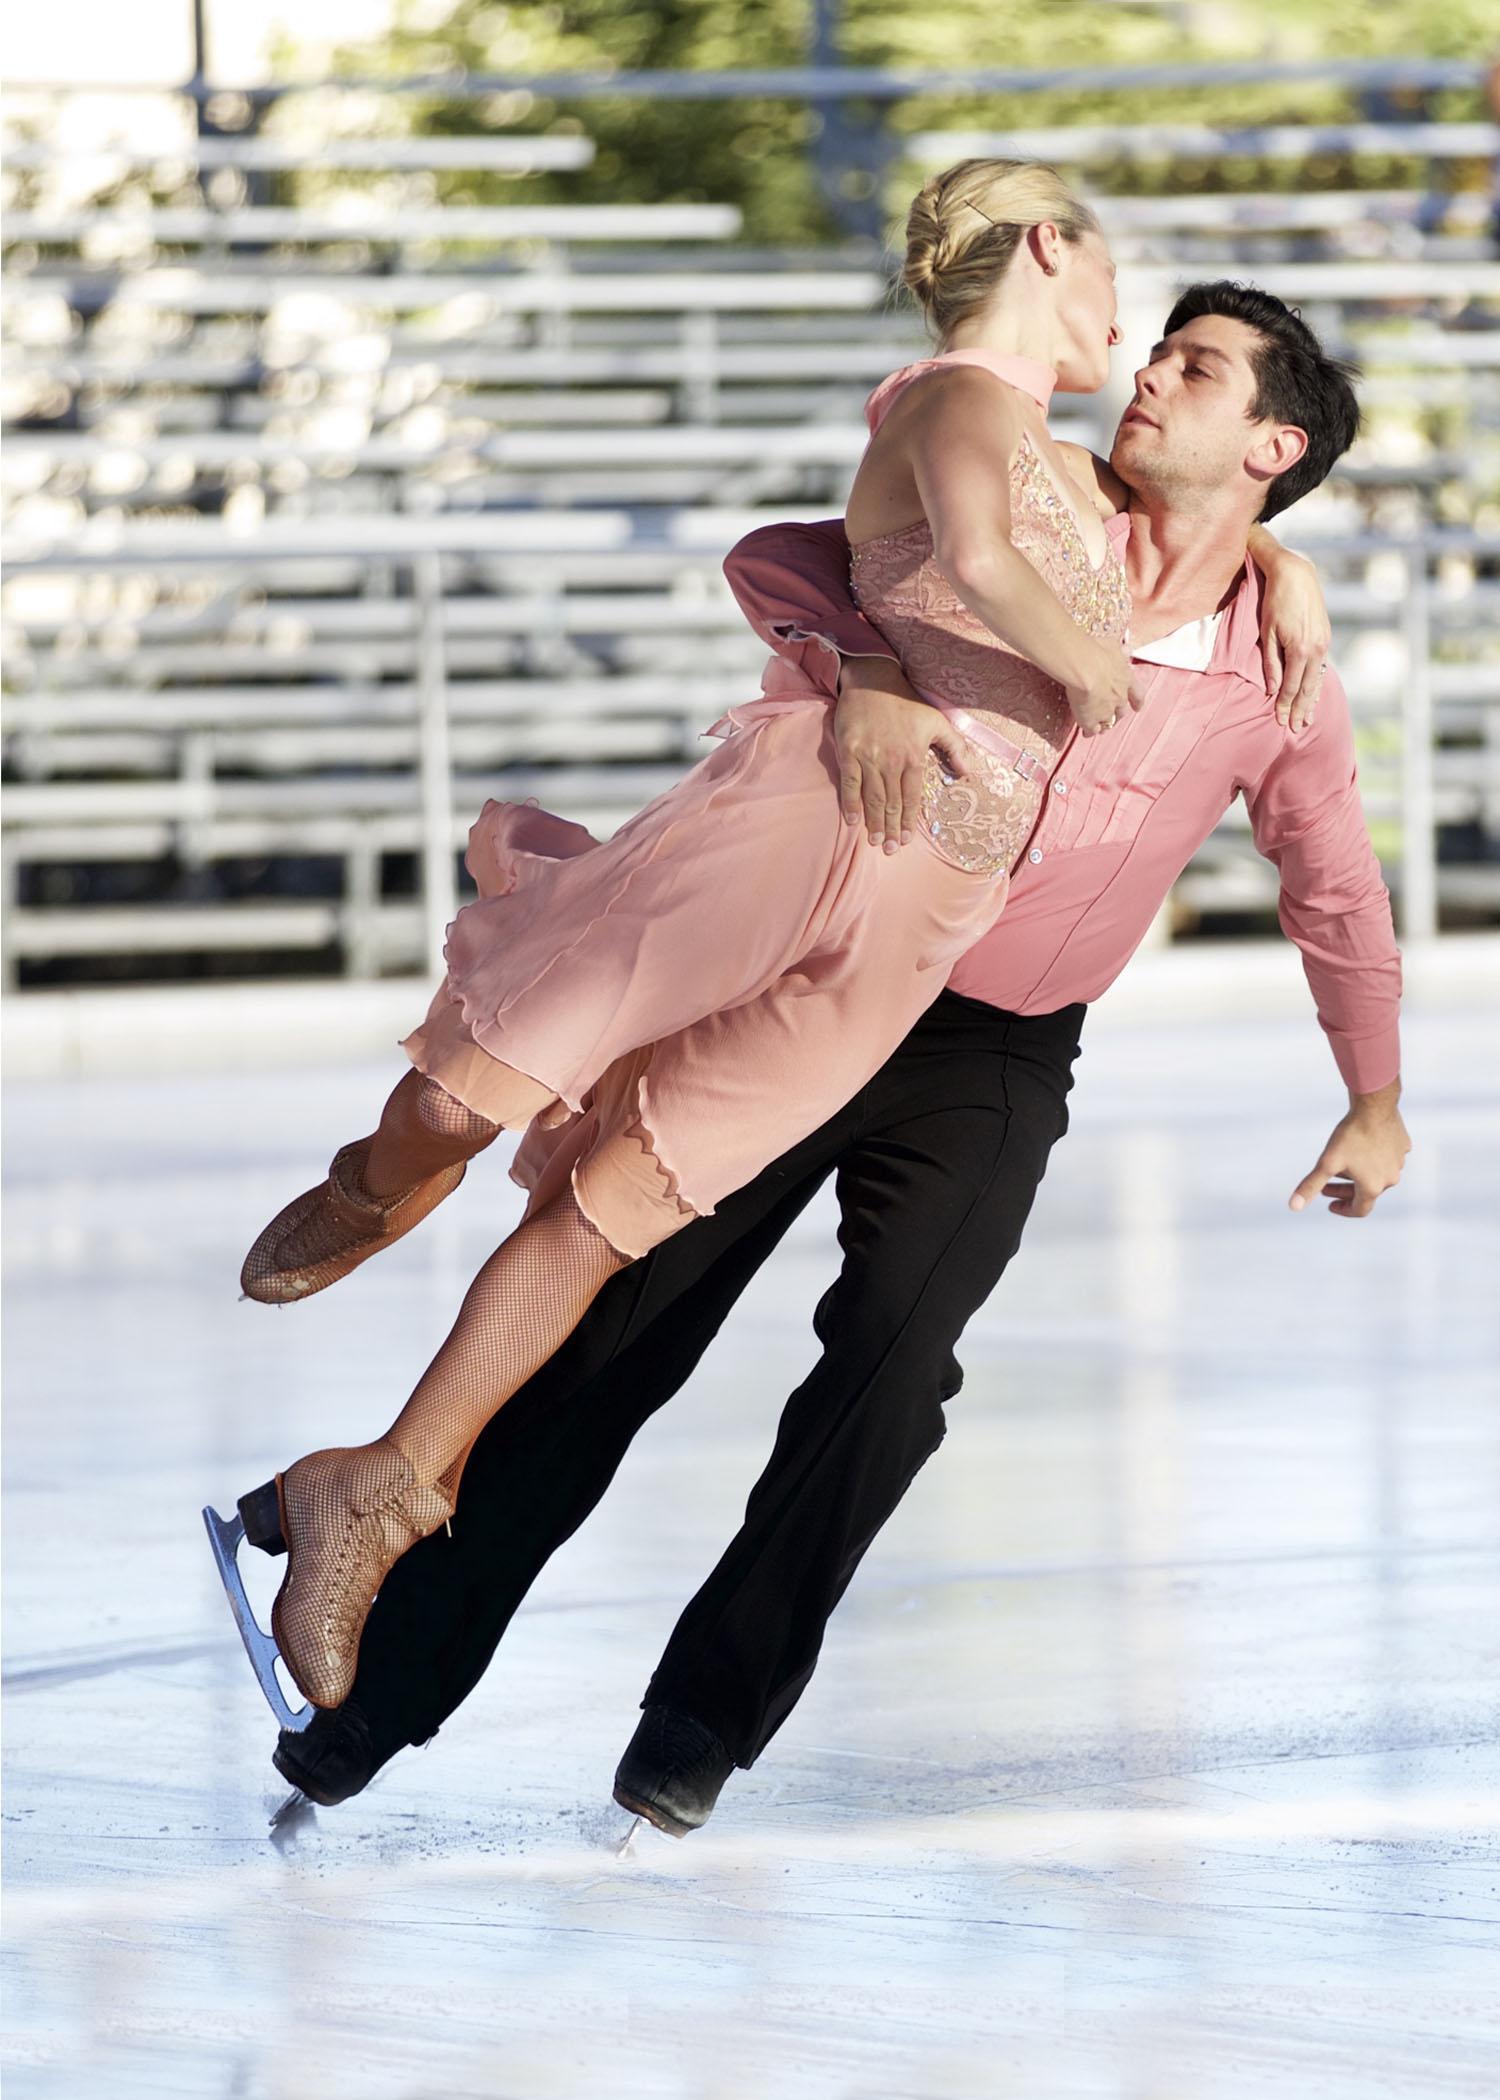 Ice Dance International ICE DANCE 2016